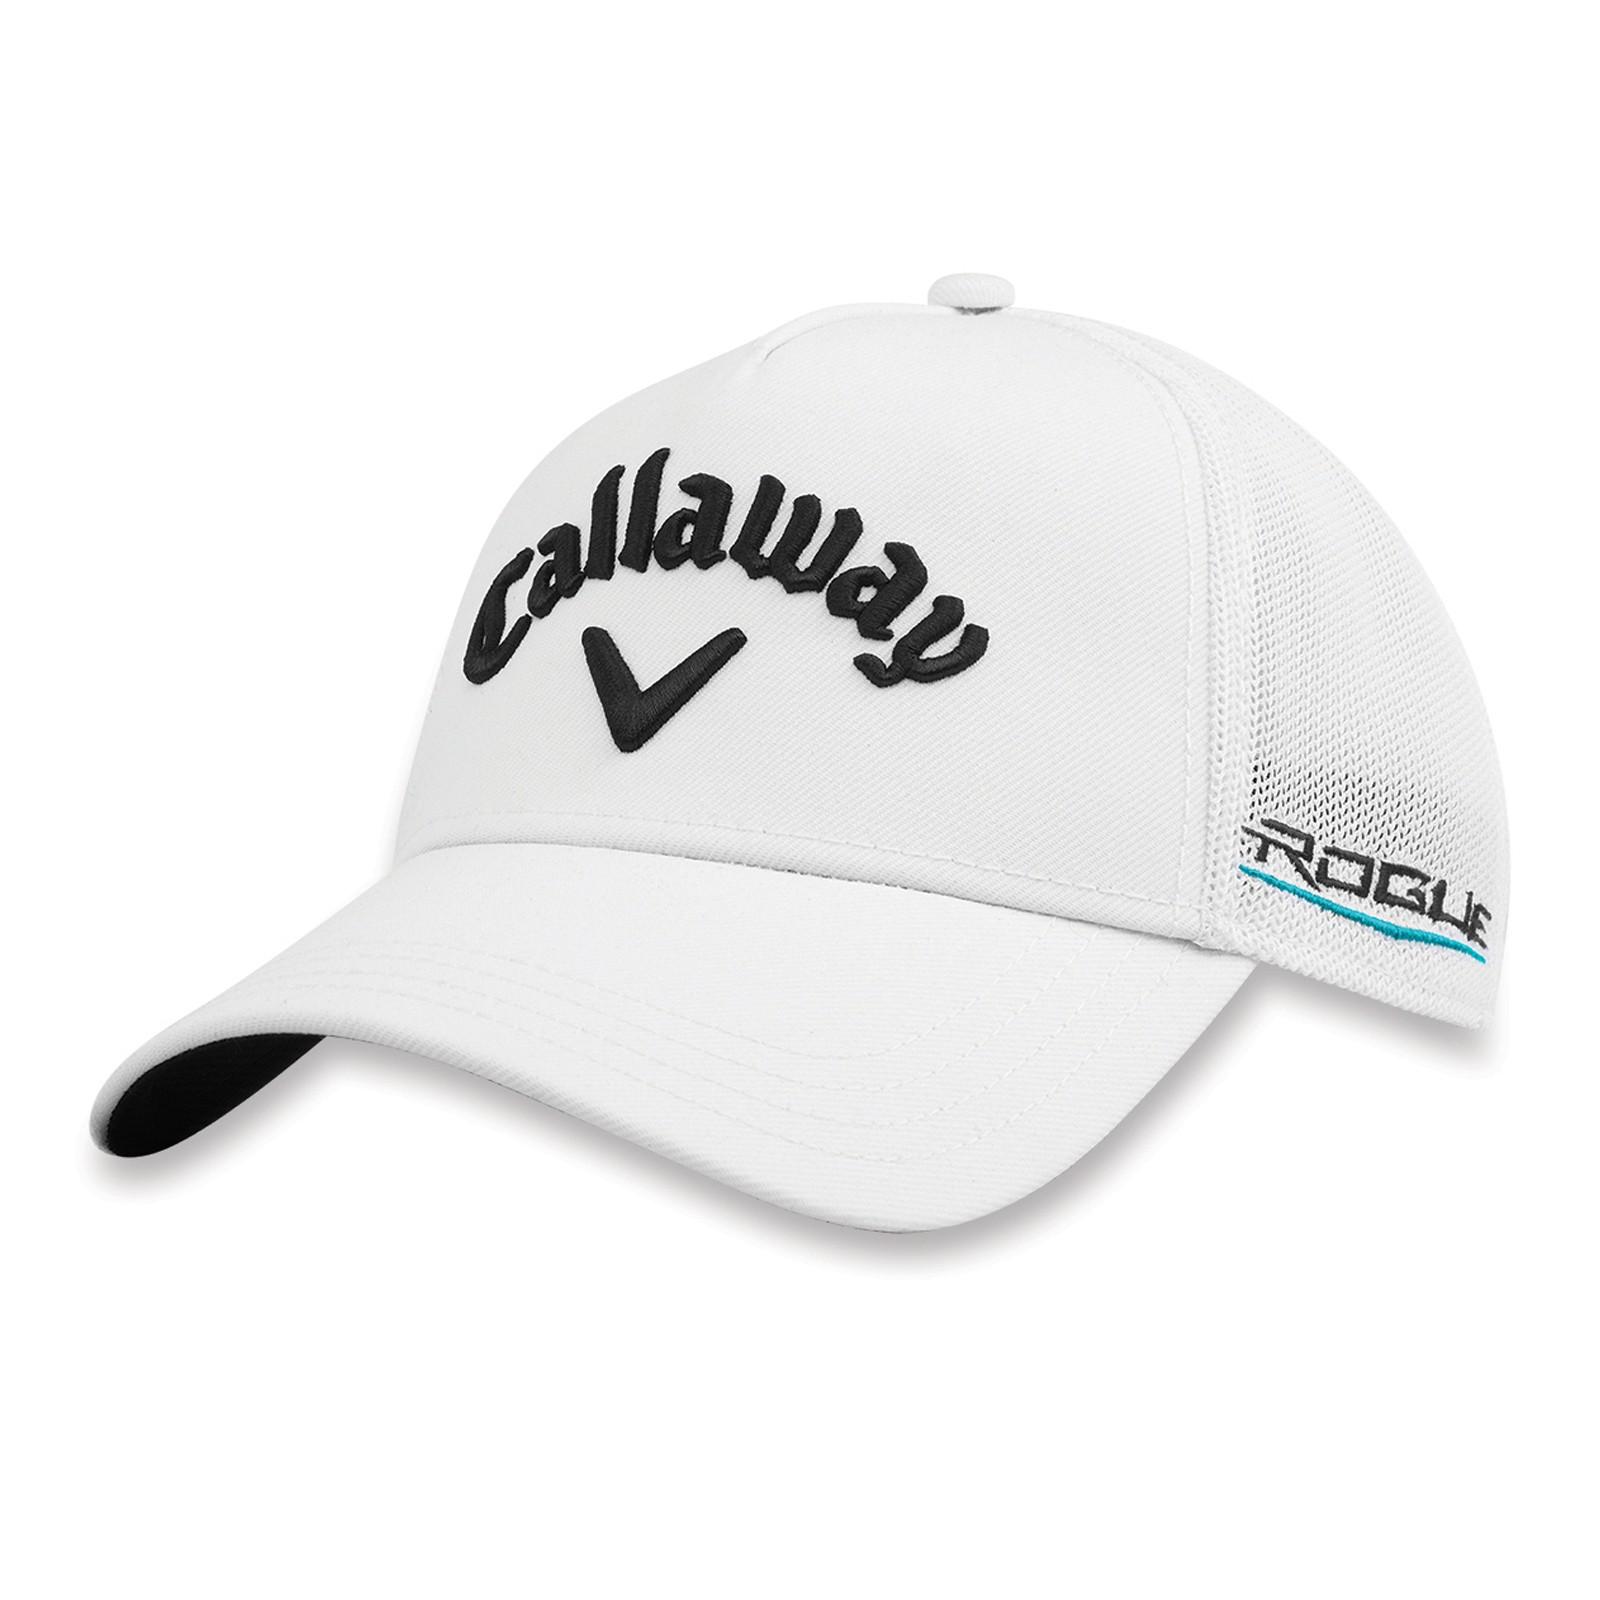 01aa4ef4f315b Callaway Tour Authentic Trucker Cap